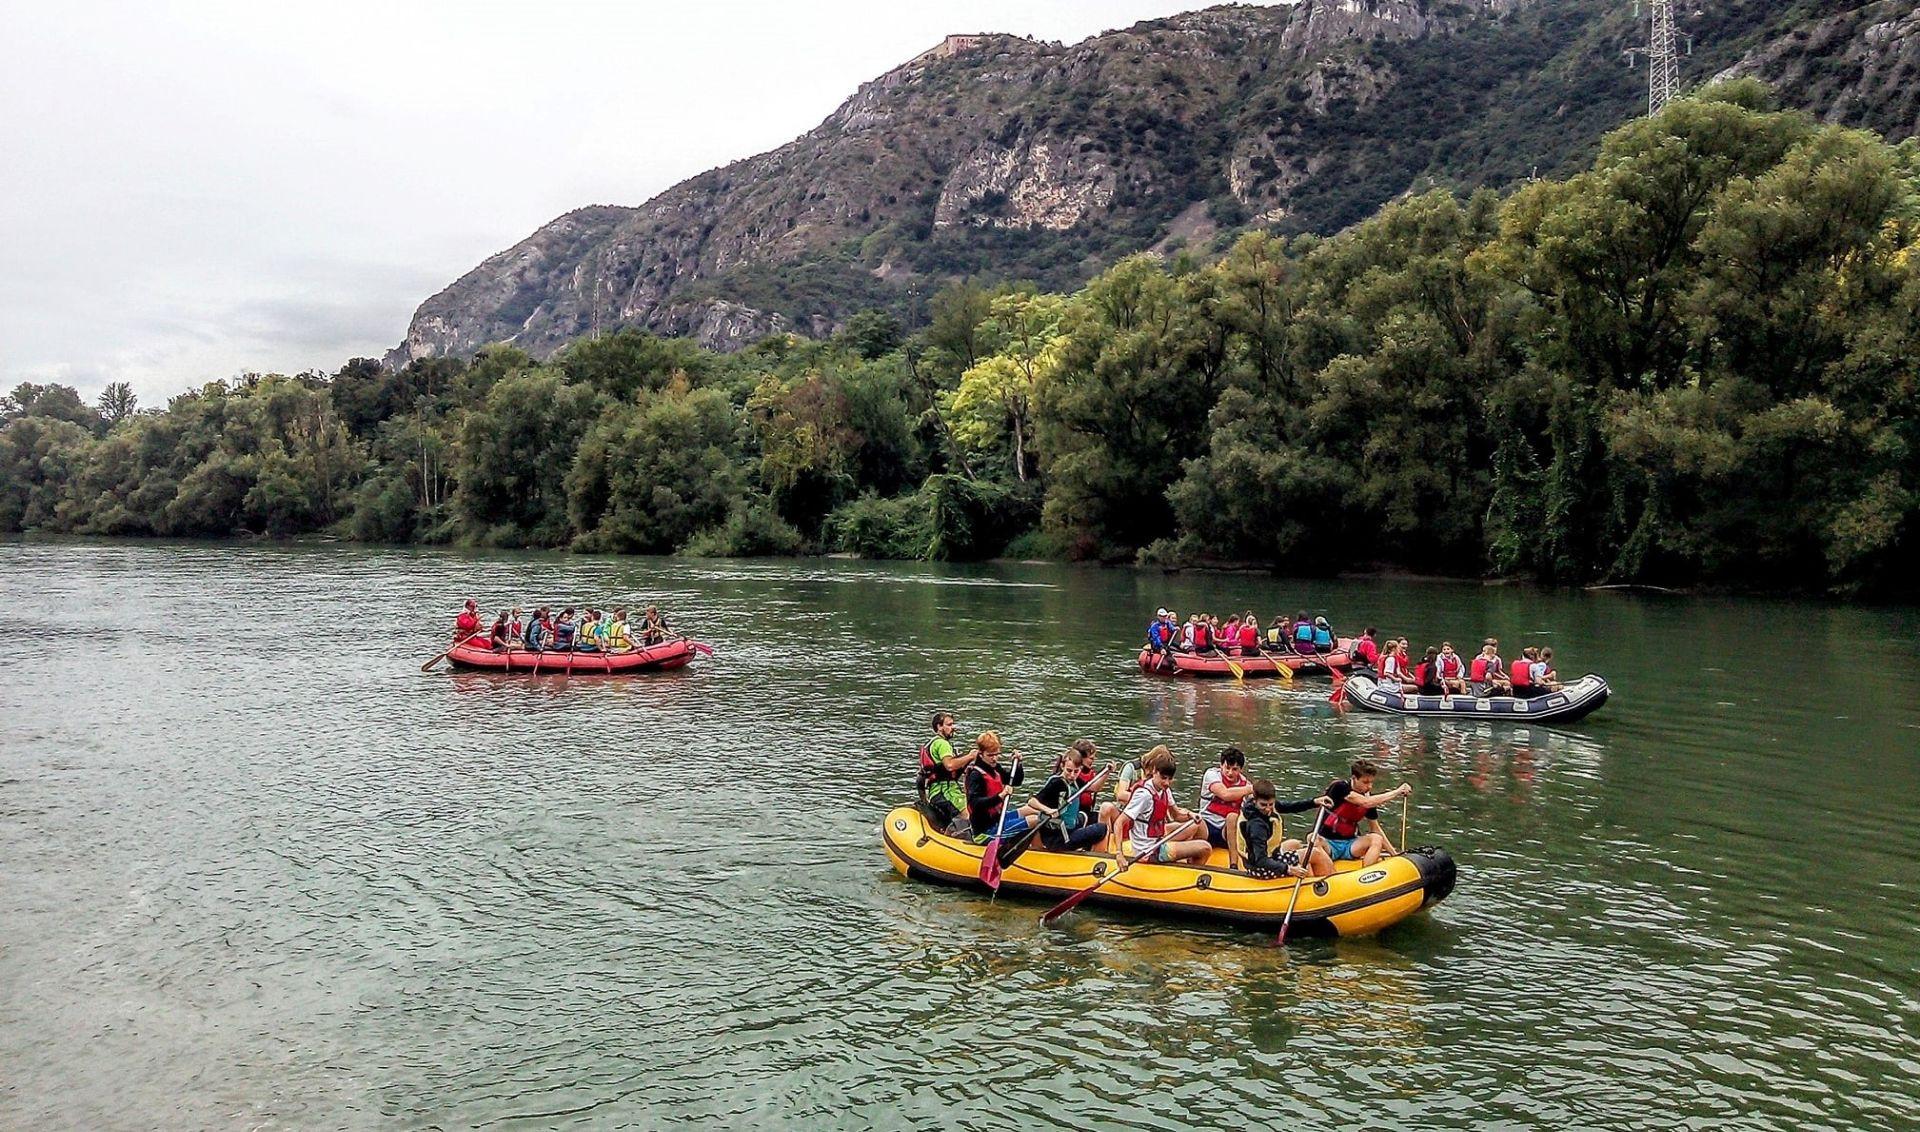 Discesa di rafting in Val d'Adige alla Chiusa di Ceraino